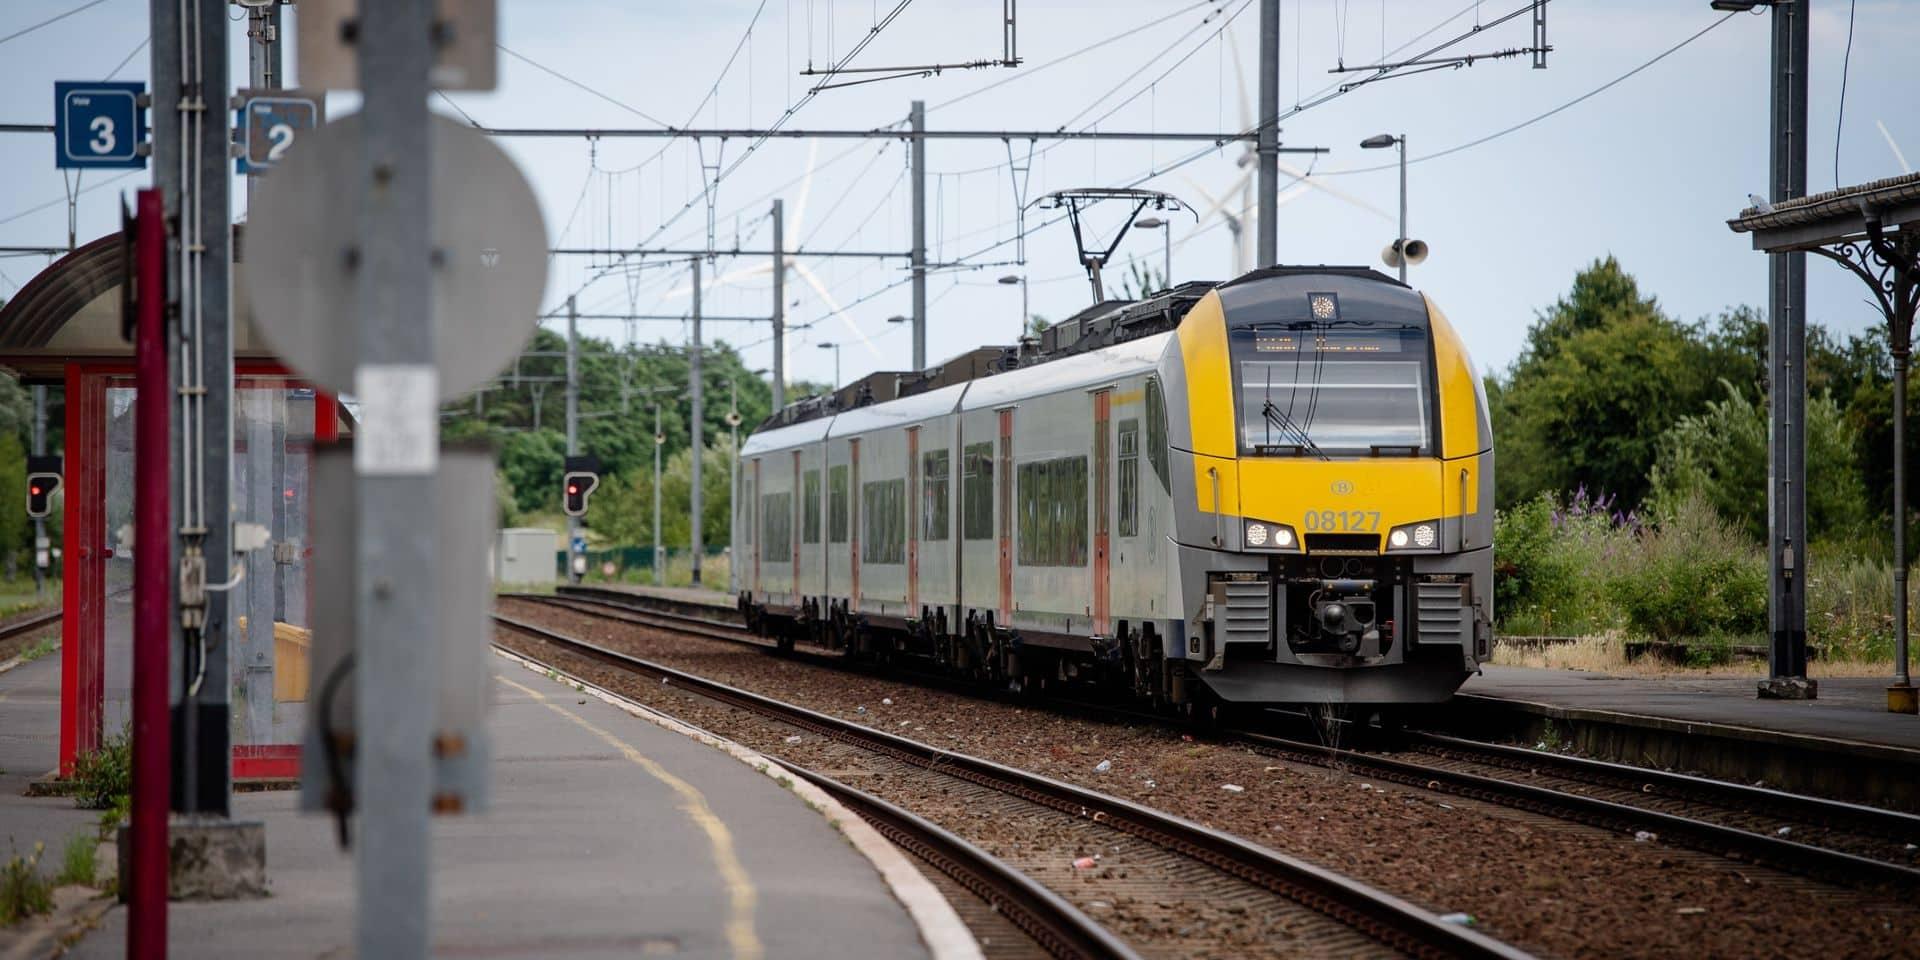 Manque d'investissements, libéralisation imminente... Les chemins de fer pressent le futur exécutif